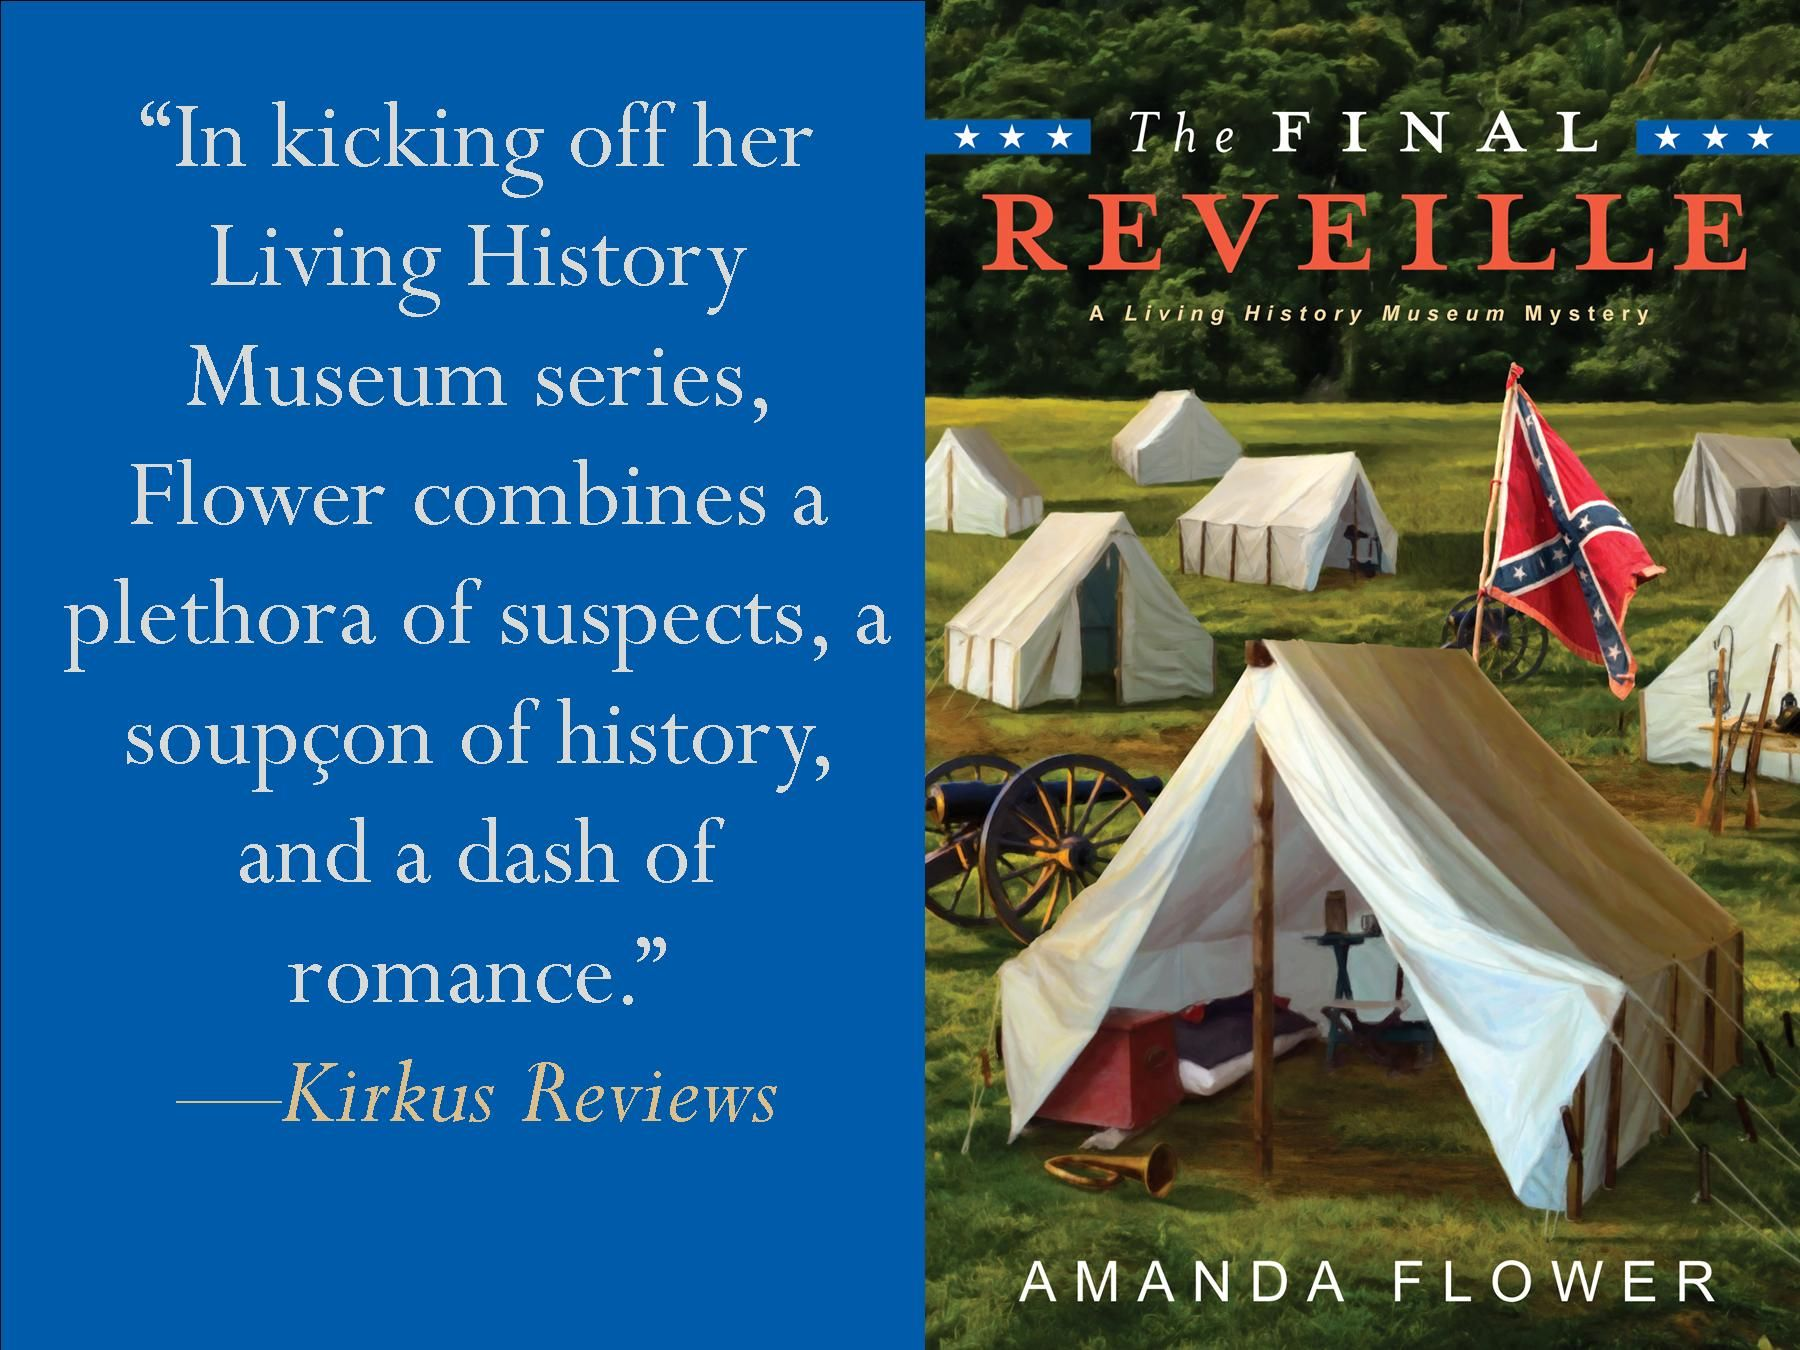 Praise for THE FINAL REVEILLE by Amanda Flower